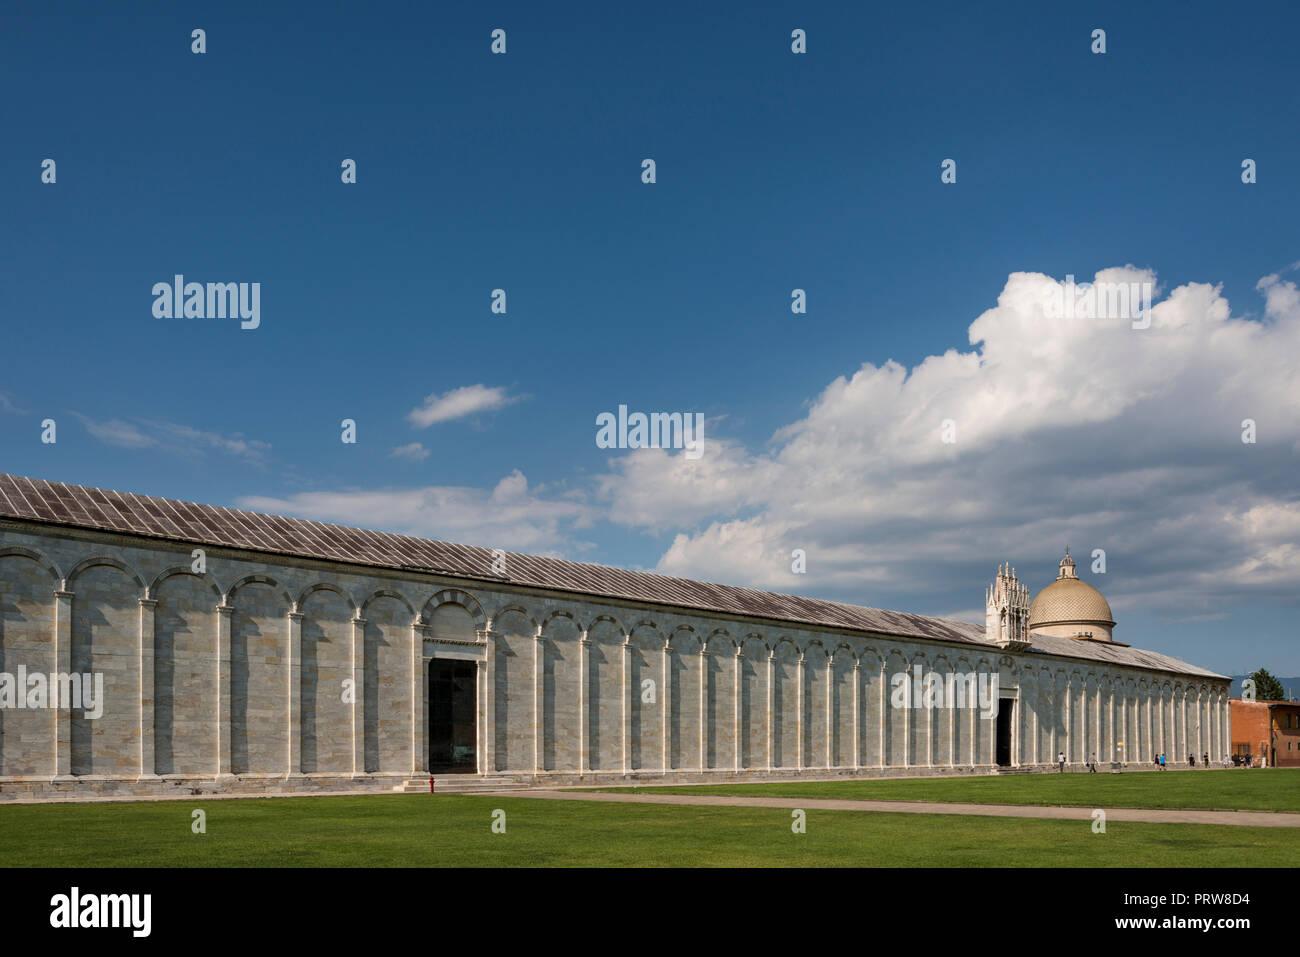 Camposanto Monumentale (cemetery) Pisa, Tuscany, Italy Stock Photo